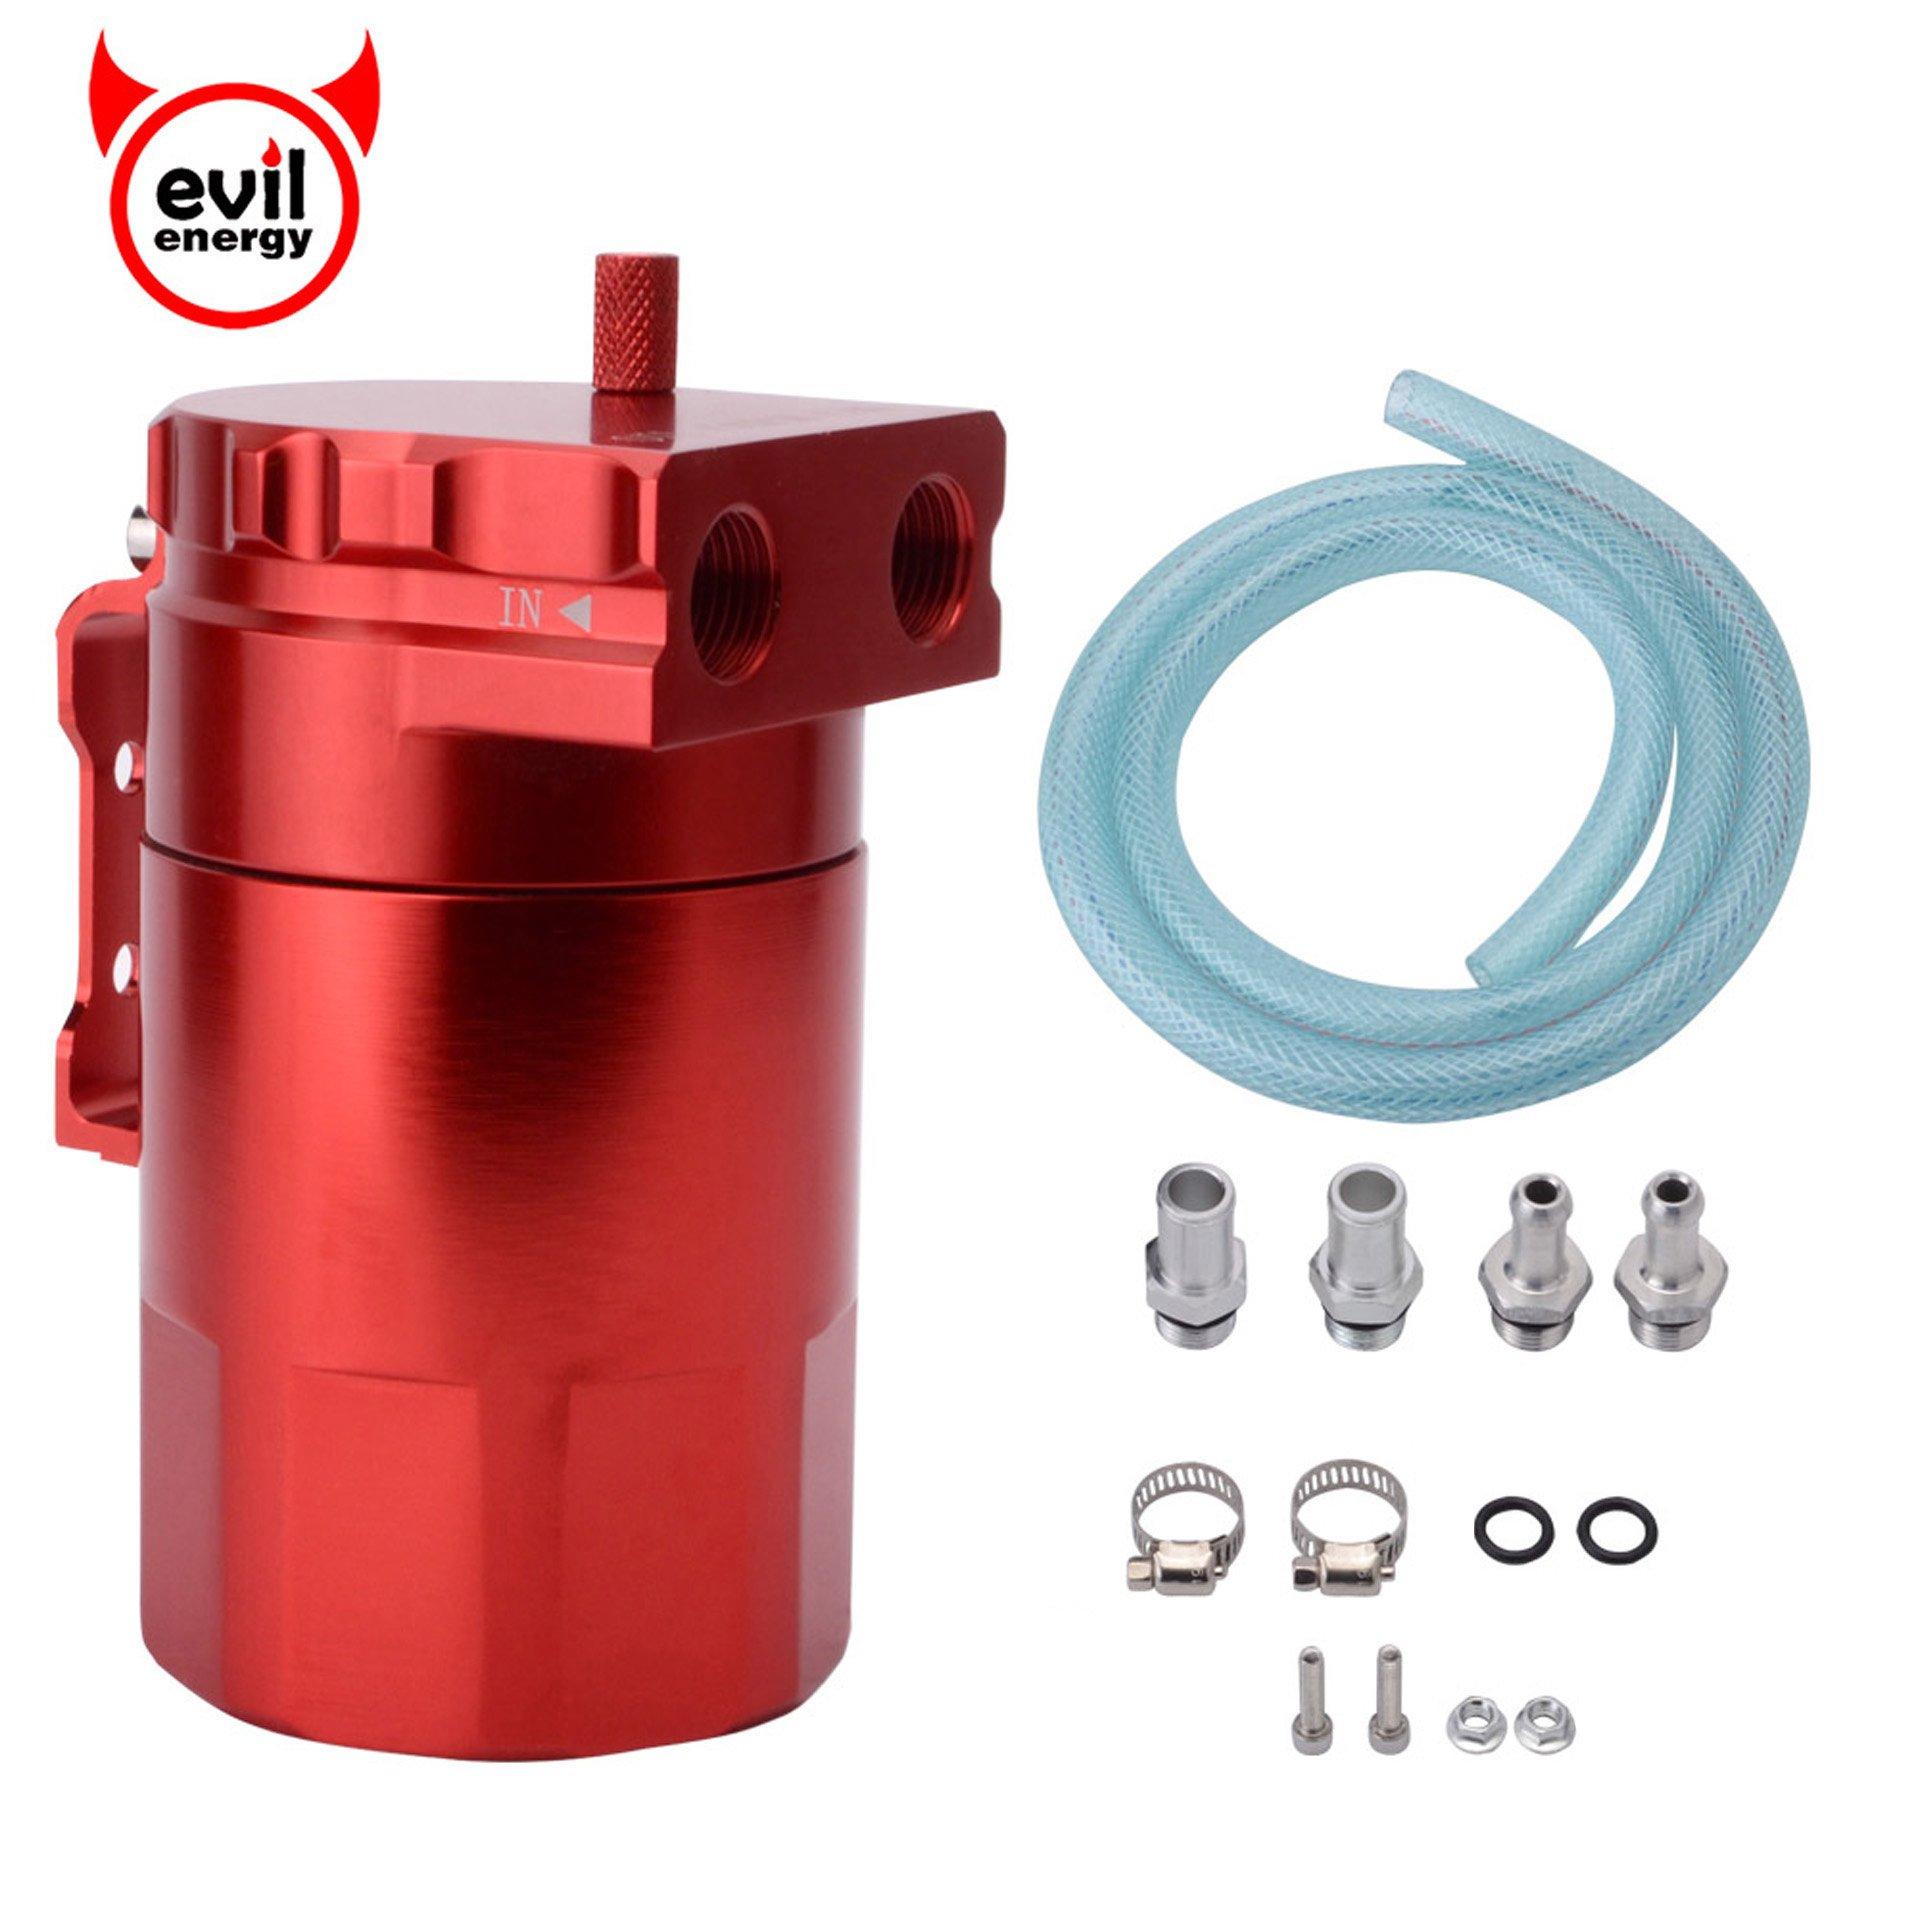 EVIL ENERGY Baffled Universal Oil Catch Can Reservoir Tank Breather Filter Kit